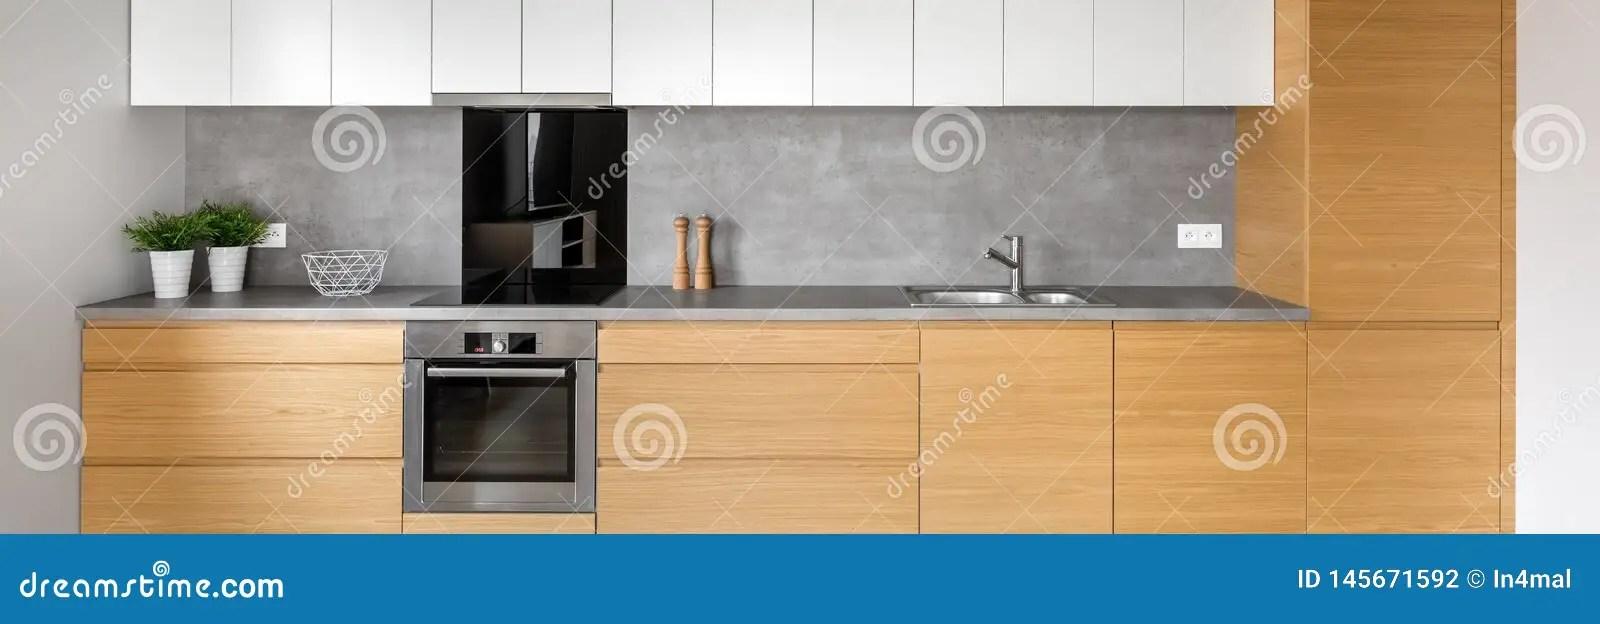 https fr dreamstime com cuisine carrelage gris panorama moderne les armoires brunes blanches grises plan travail granit image145671592